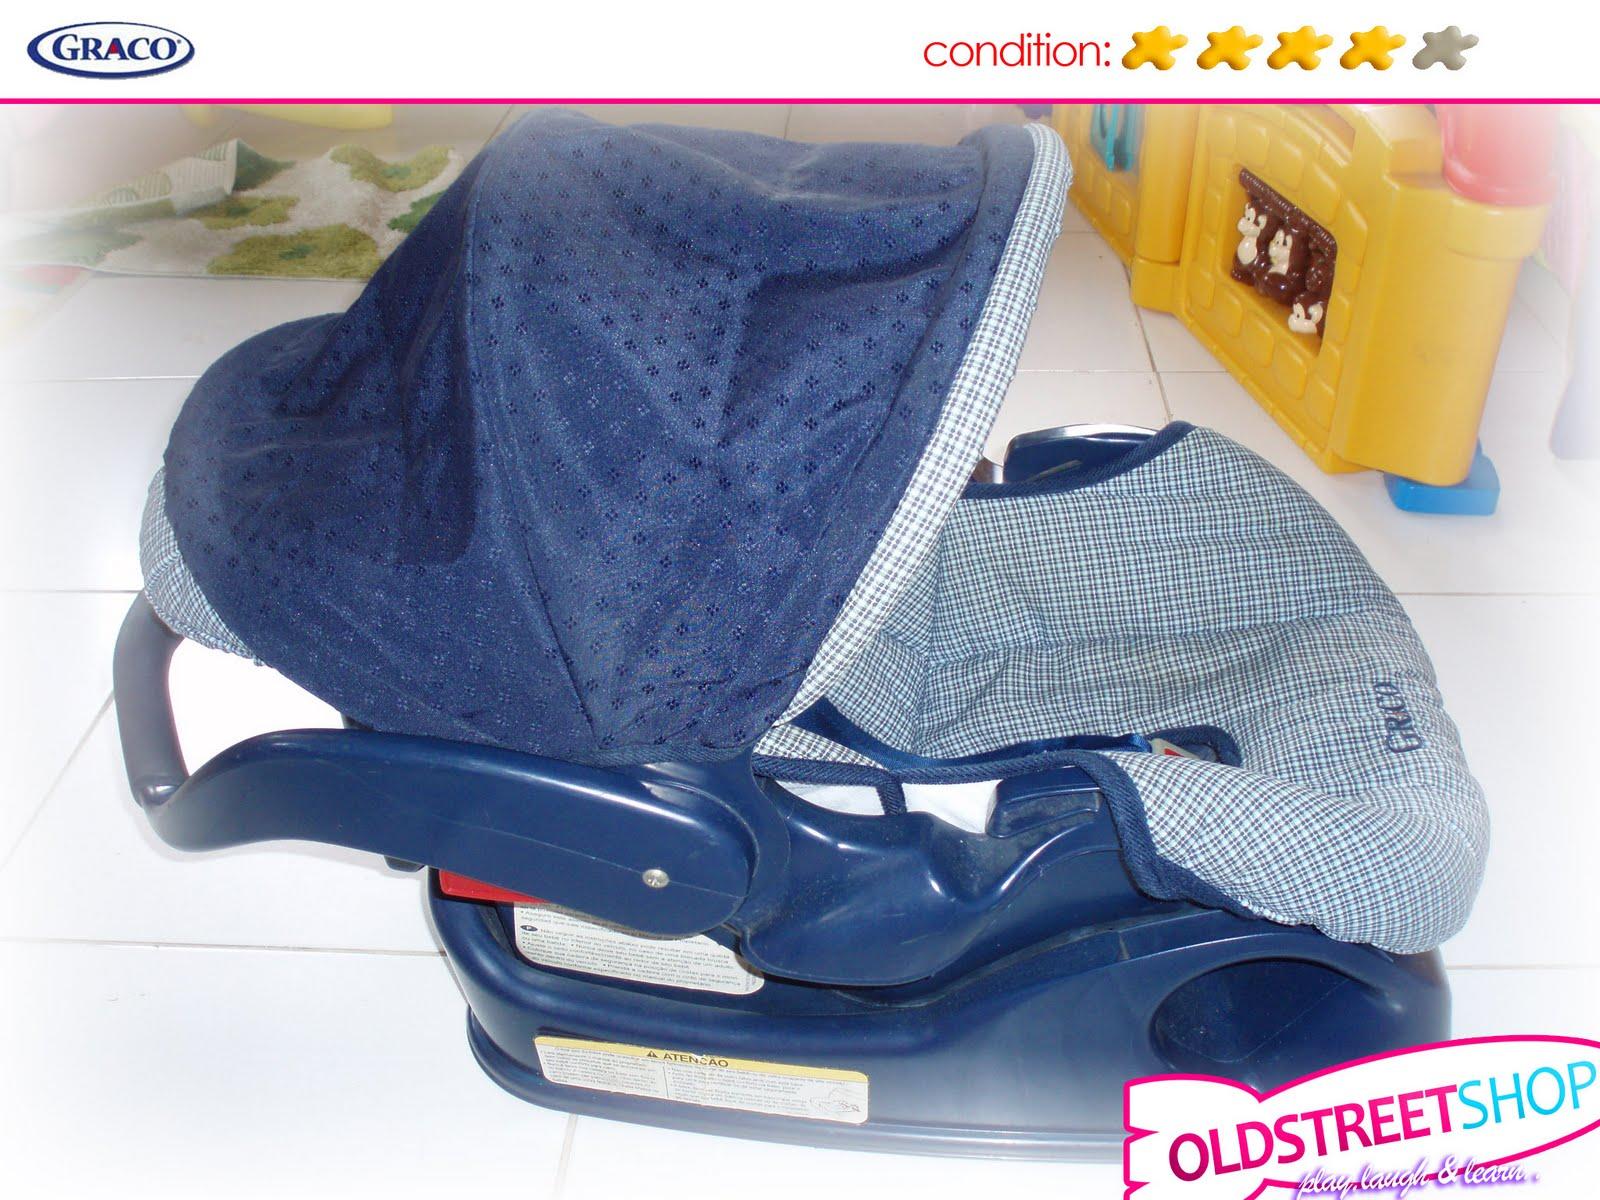 oldstreetshop graco literider car seat with base. Black Bedroom Furniture Sets. Home Design Ideas